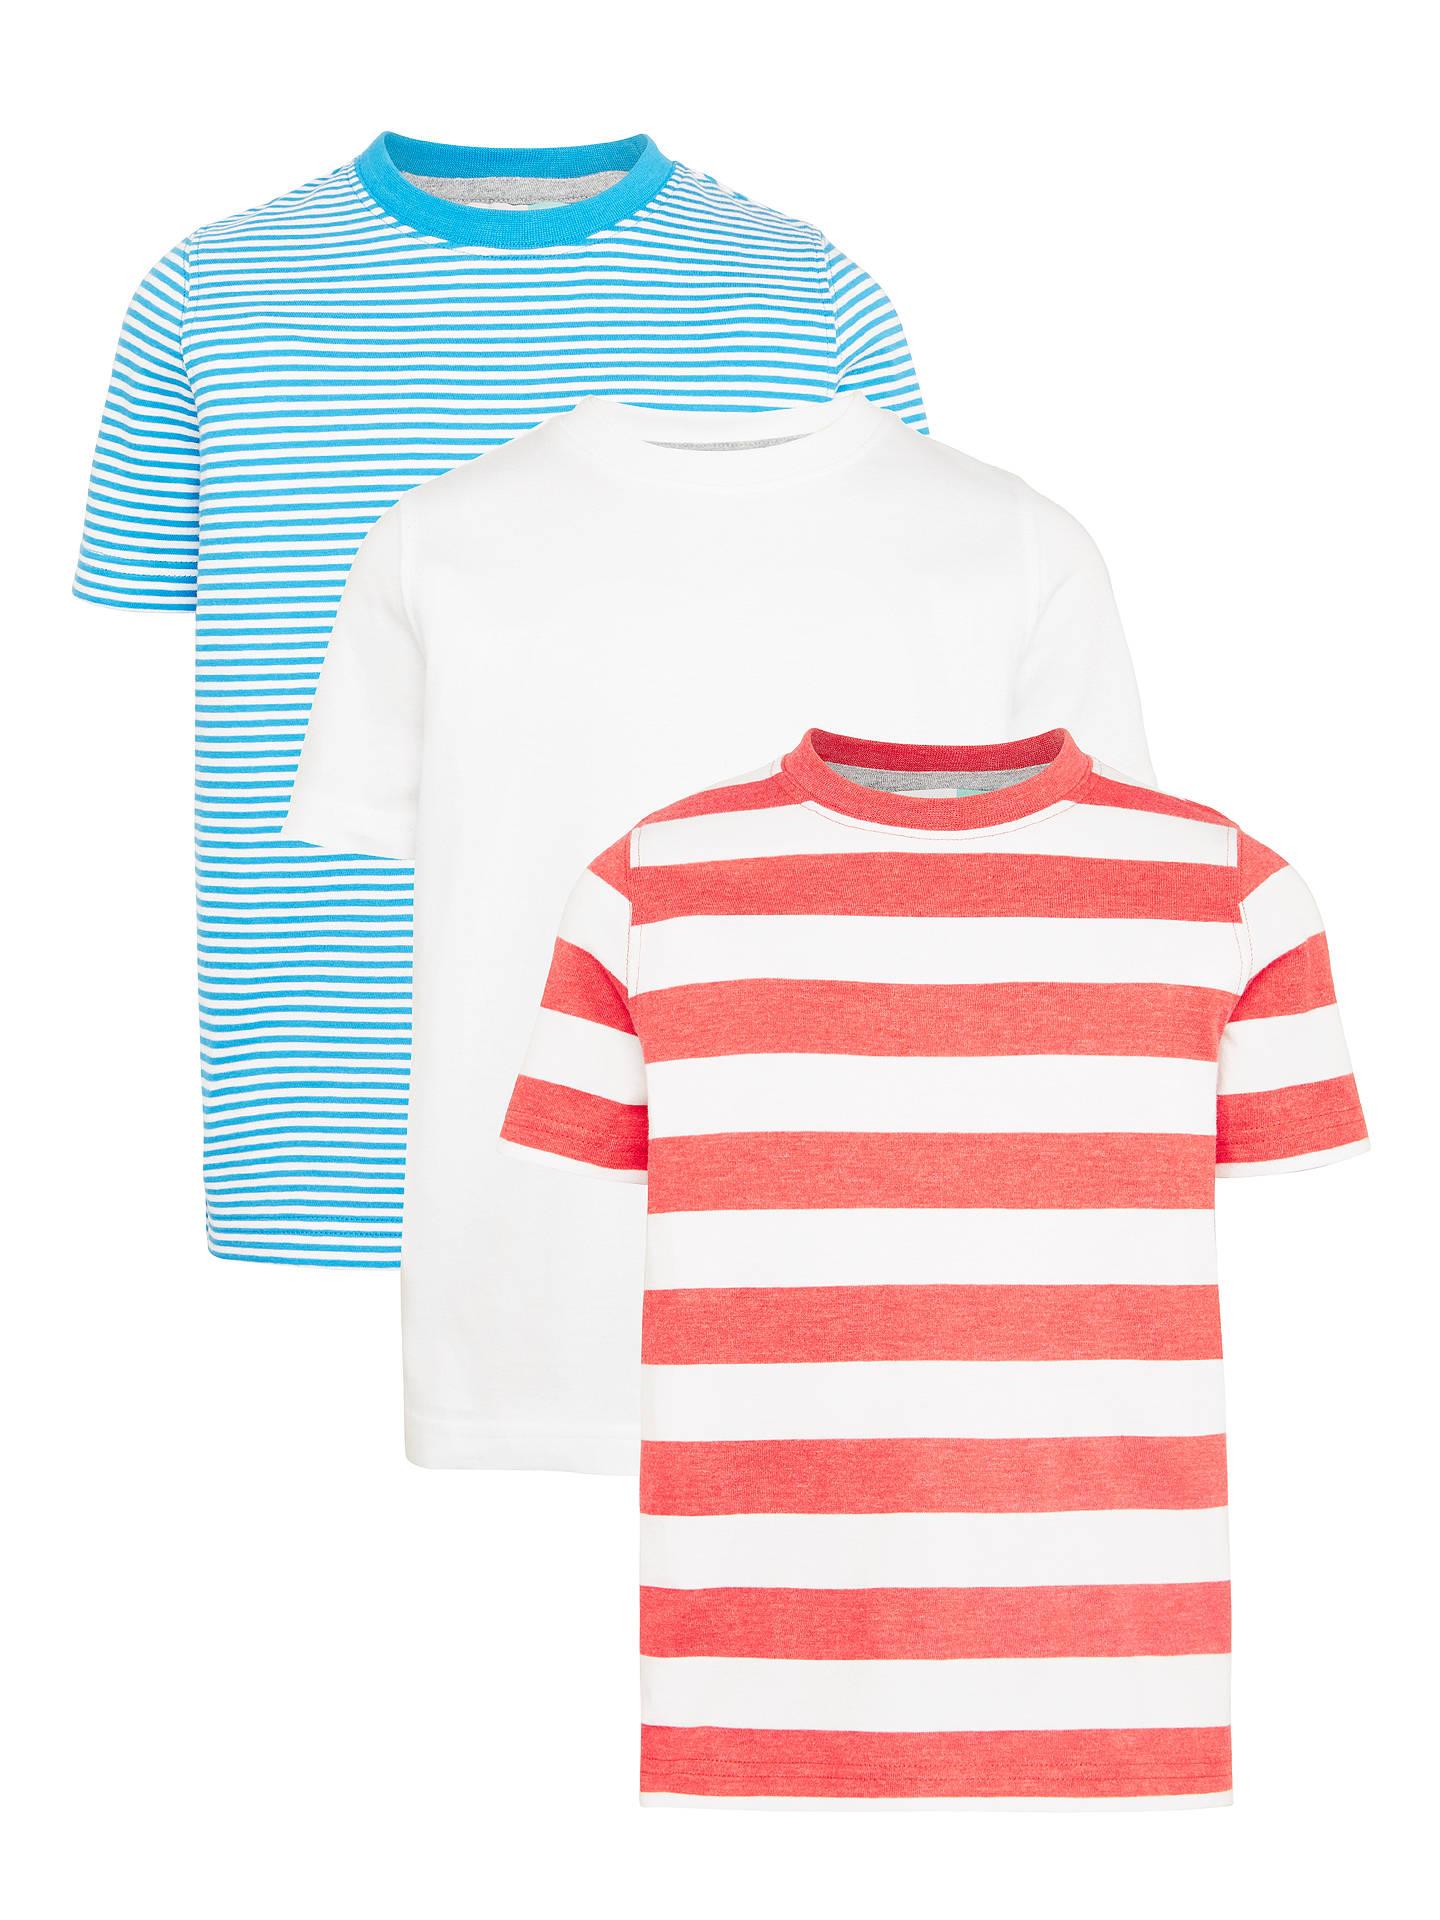 365a0f167a4 Buy John Lewis Boys  Striped T-Shirt